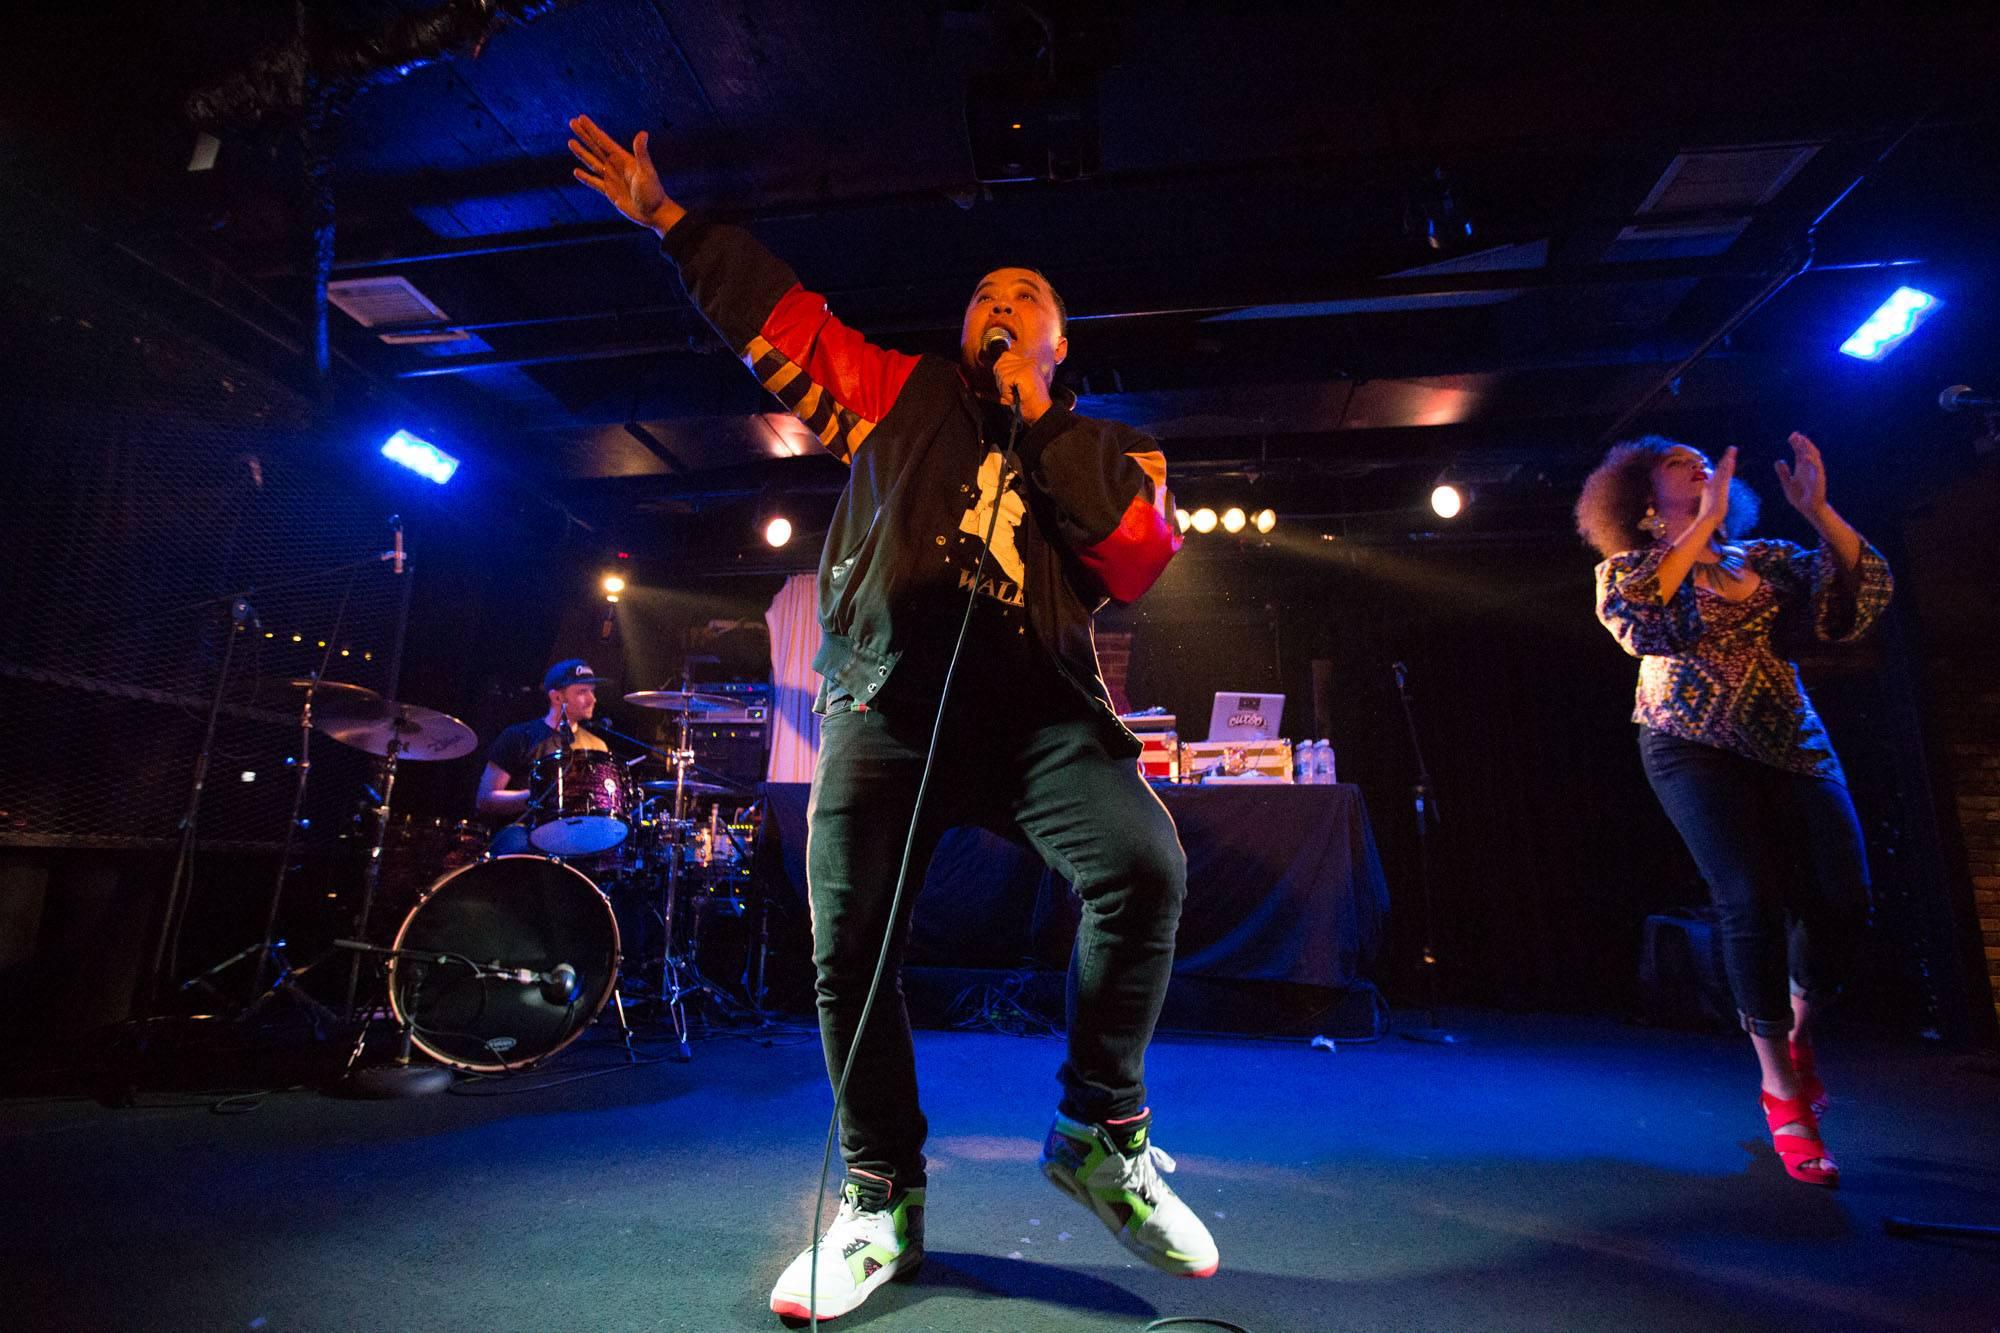 Lyrics Born at the Biltmore Cabaret, Vancouver, Aug. 5 2016. Kirk Chantraine photo.